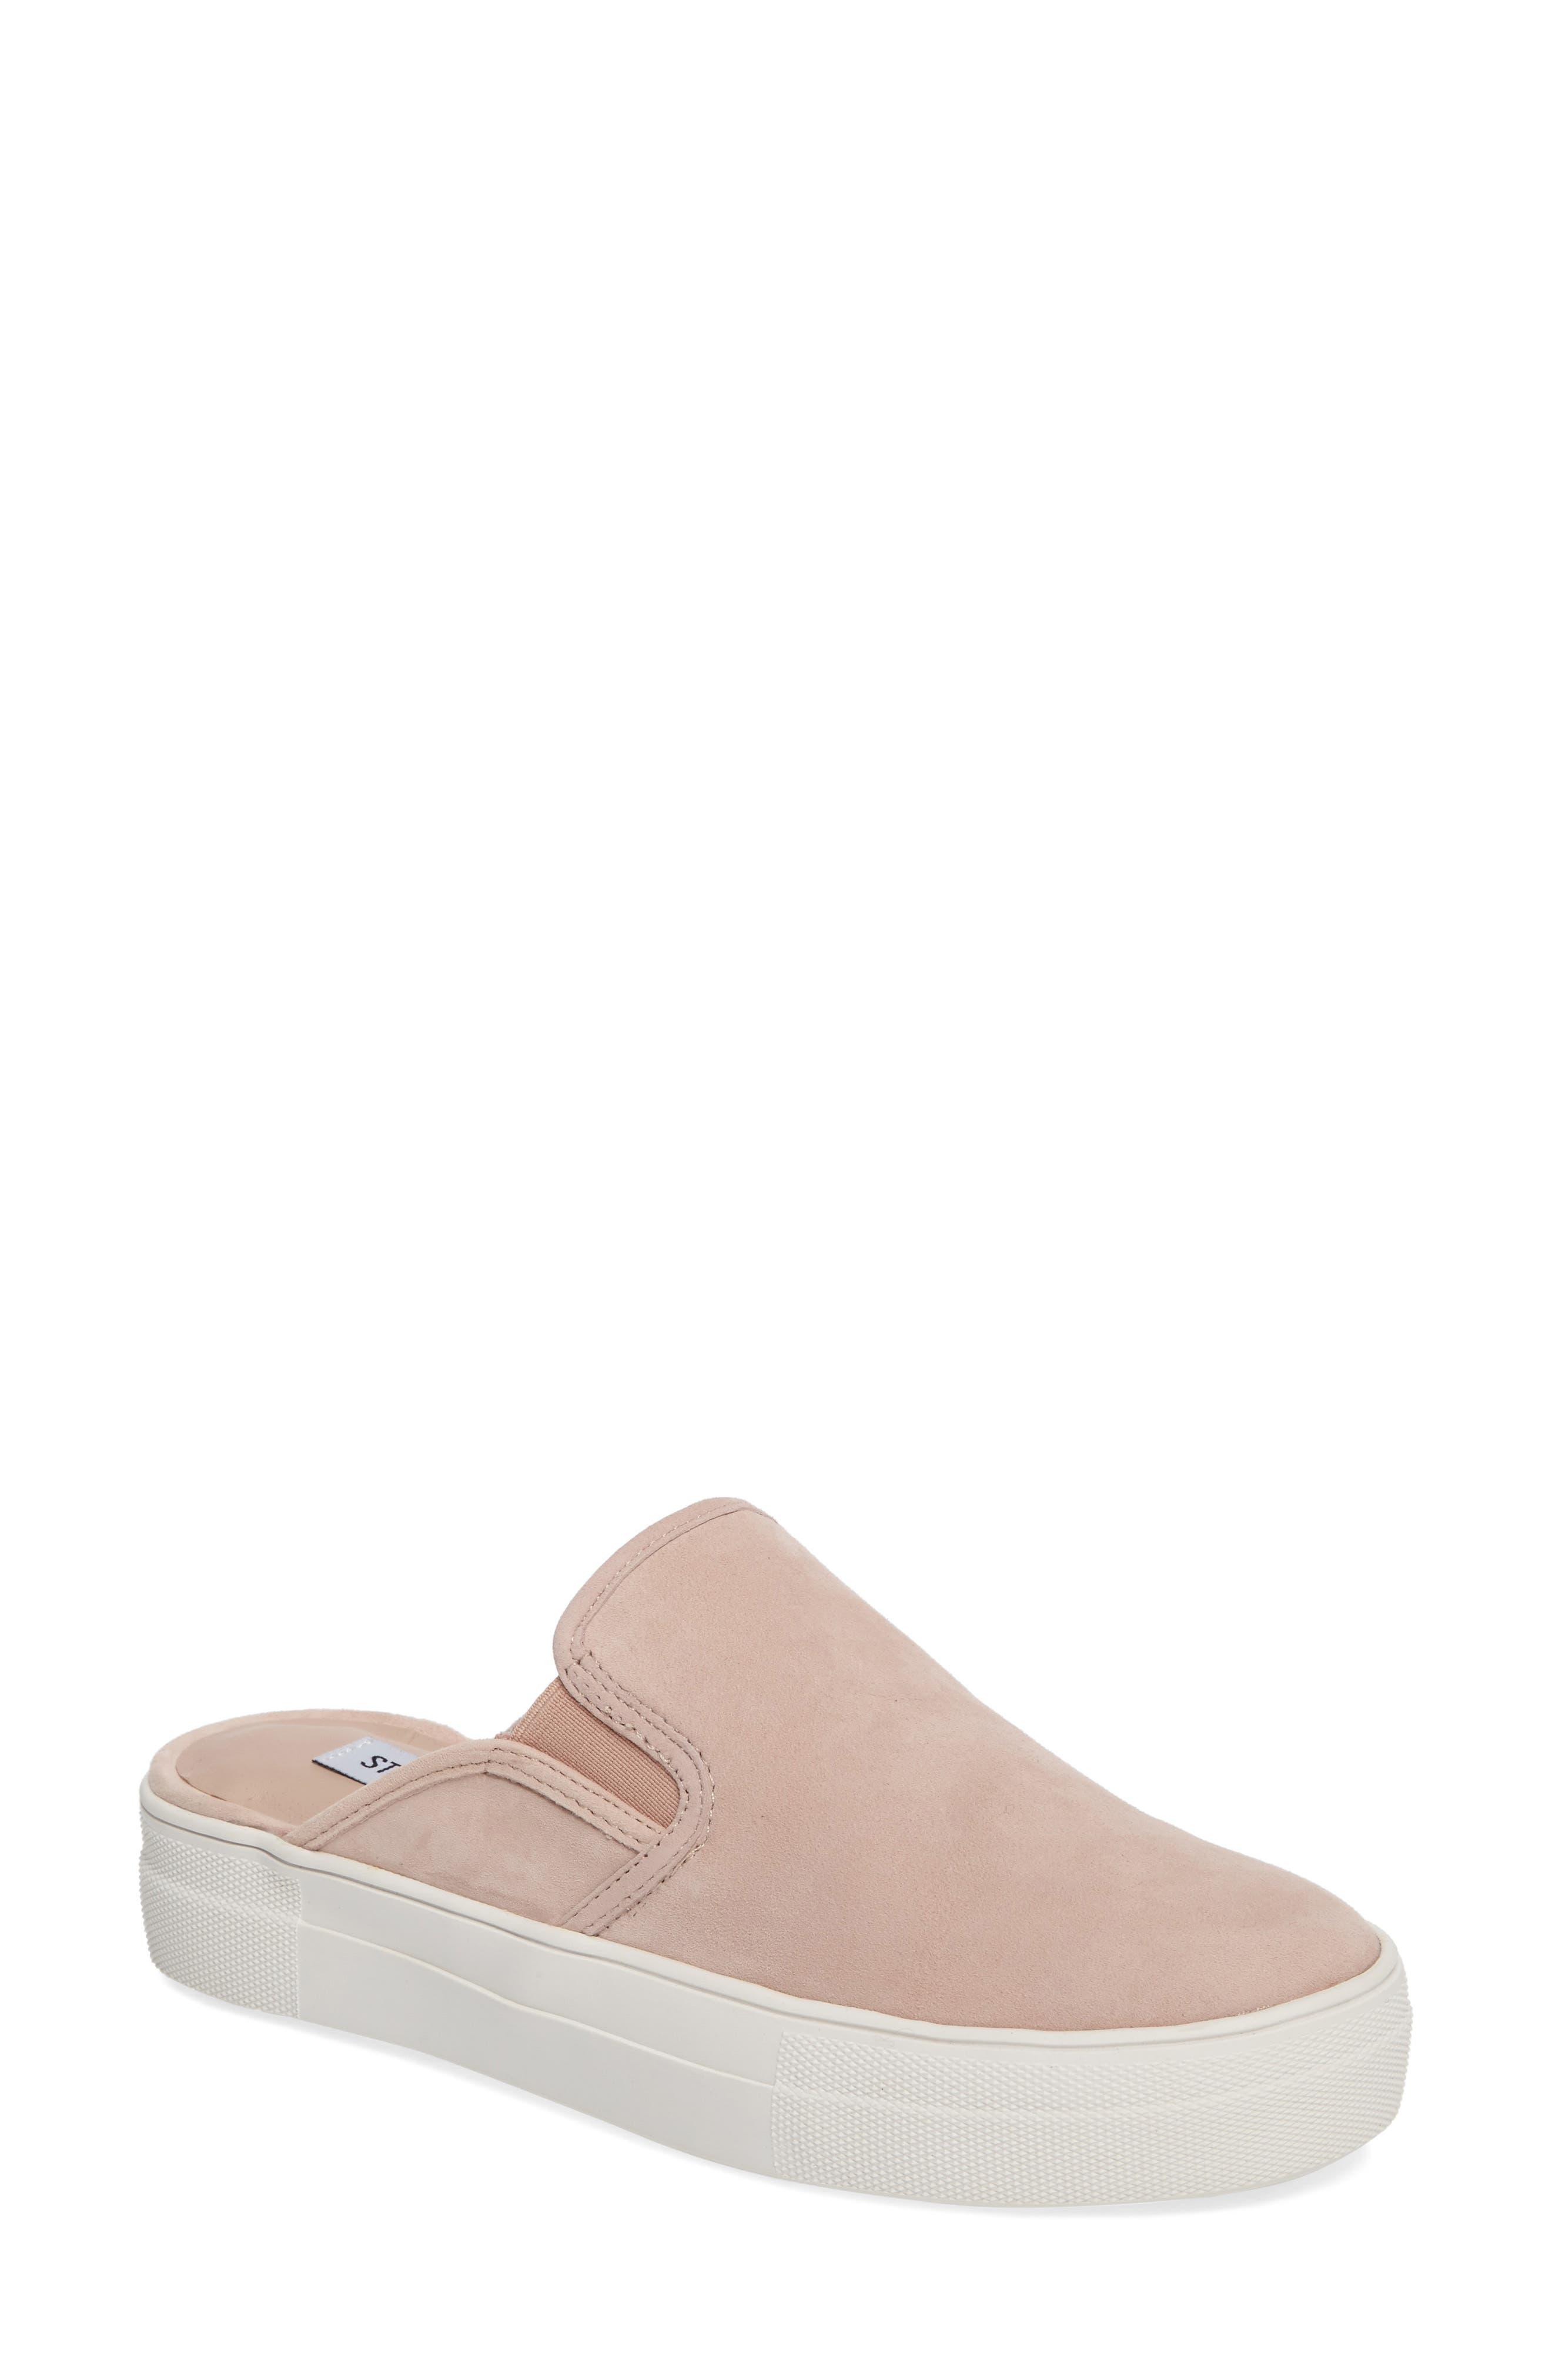 Glenda Sneaker Mule,                             Main thumbnail 1, color,                             Light Pink